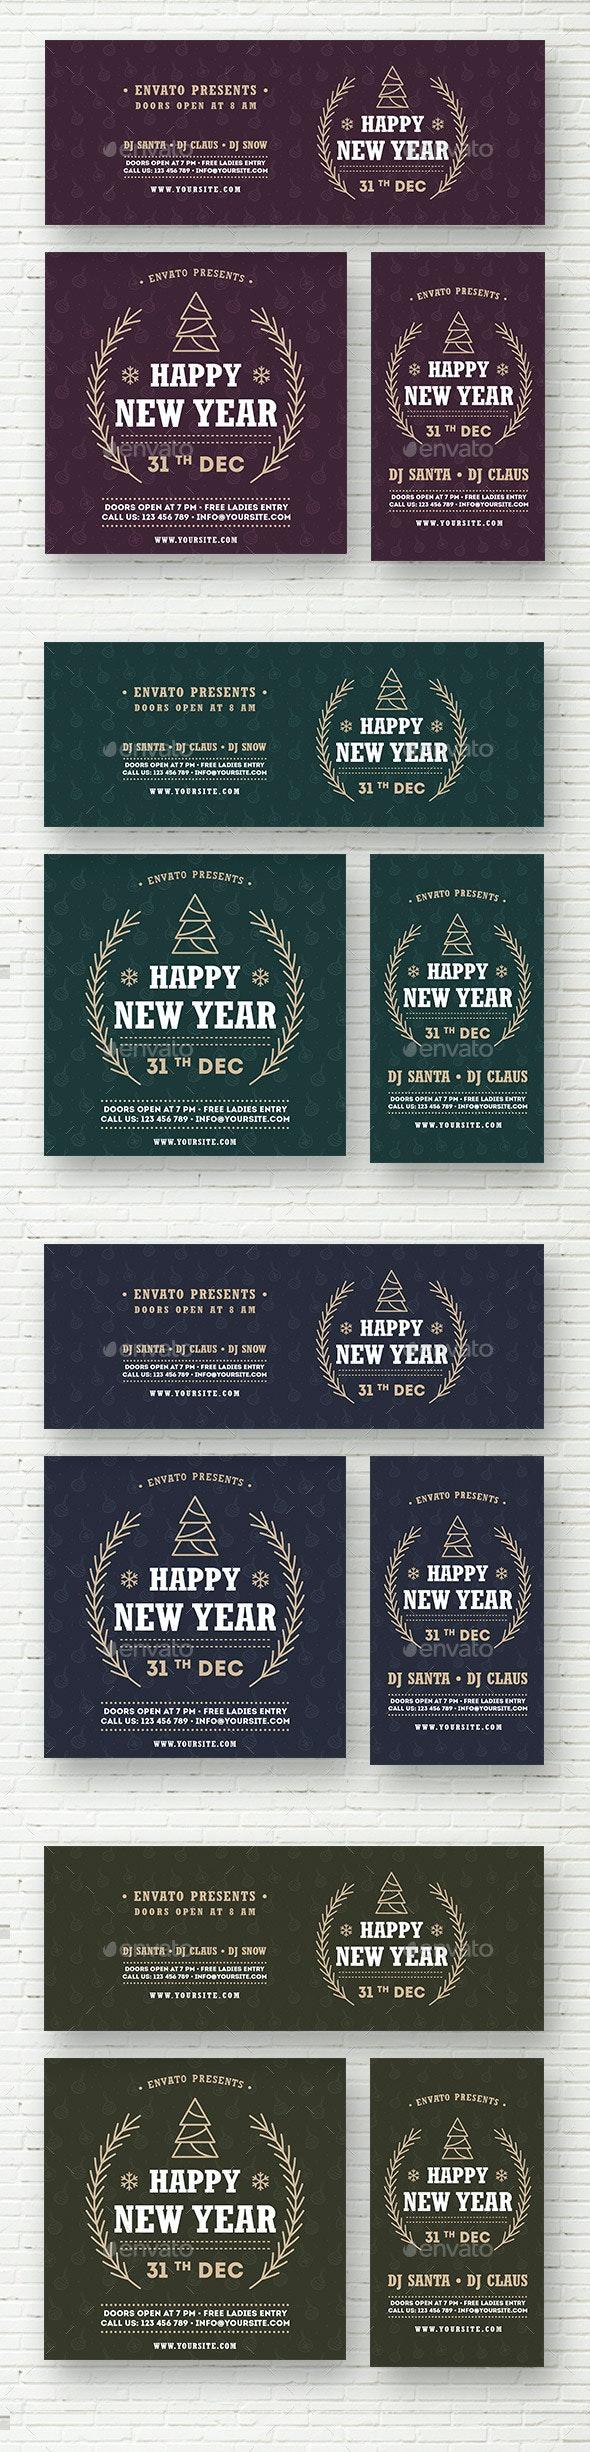 Happy New Year Social Media Template - Social Media Web Elements